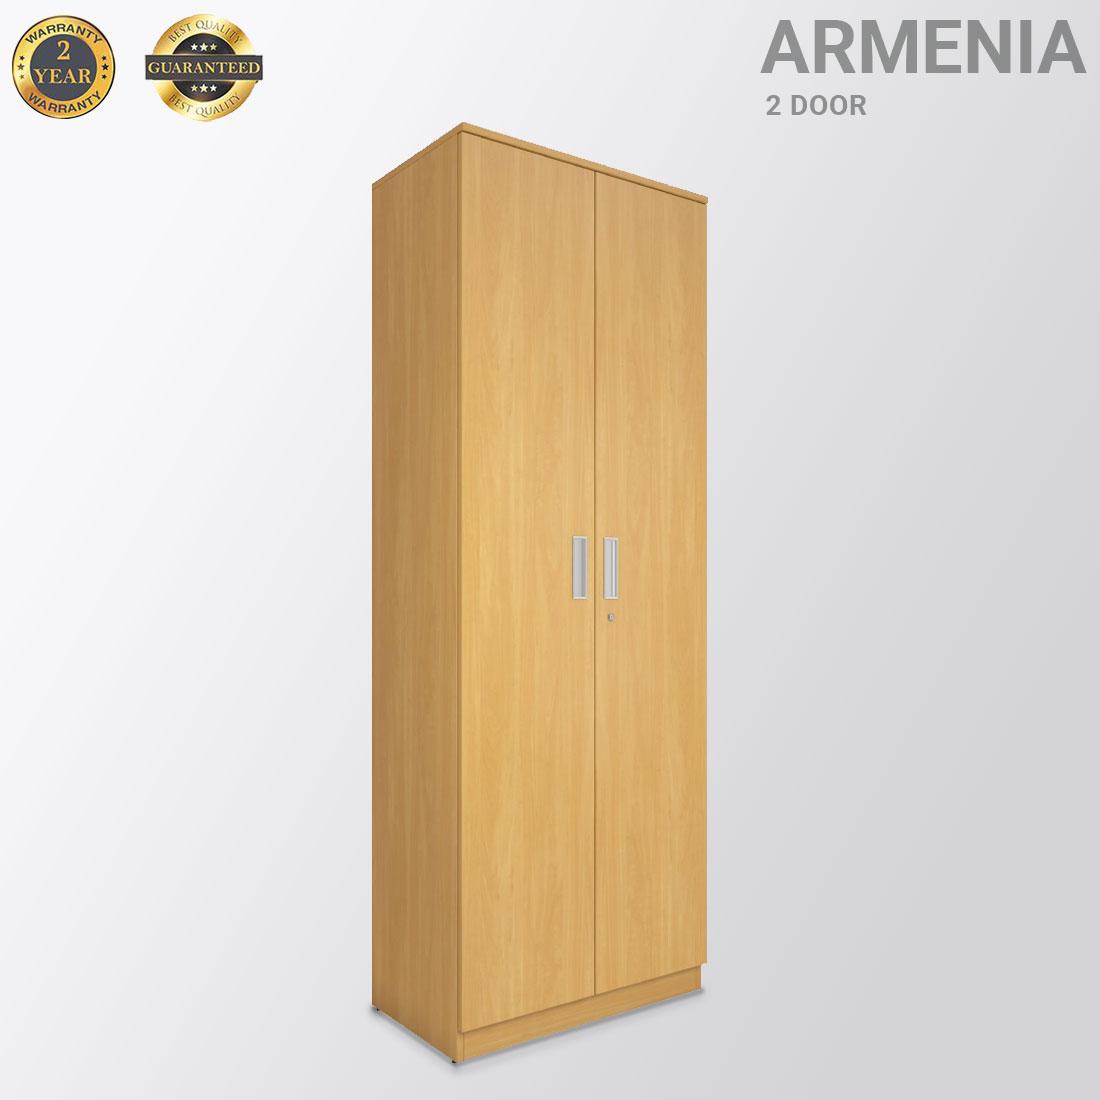 Armenia oak two door